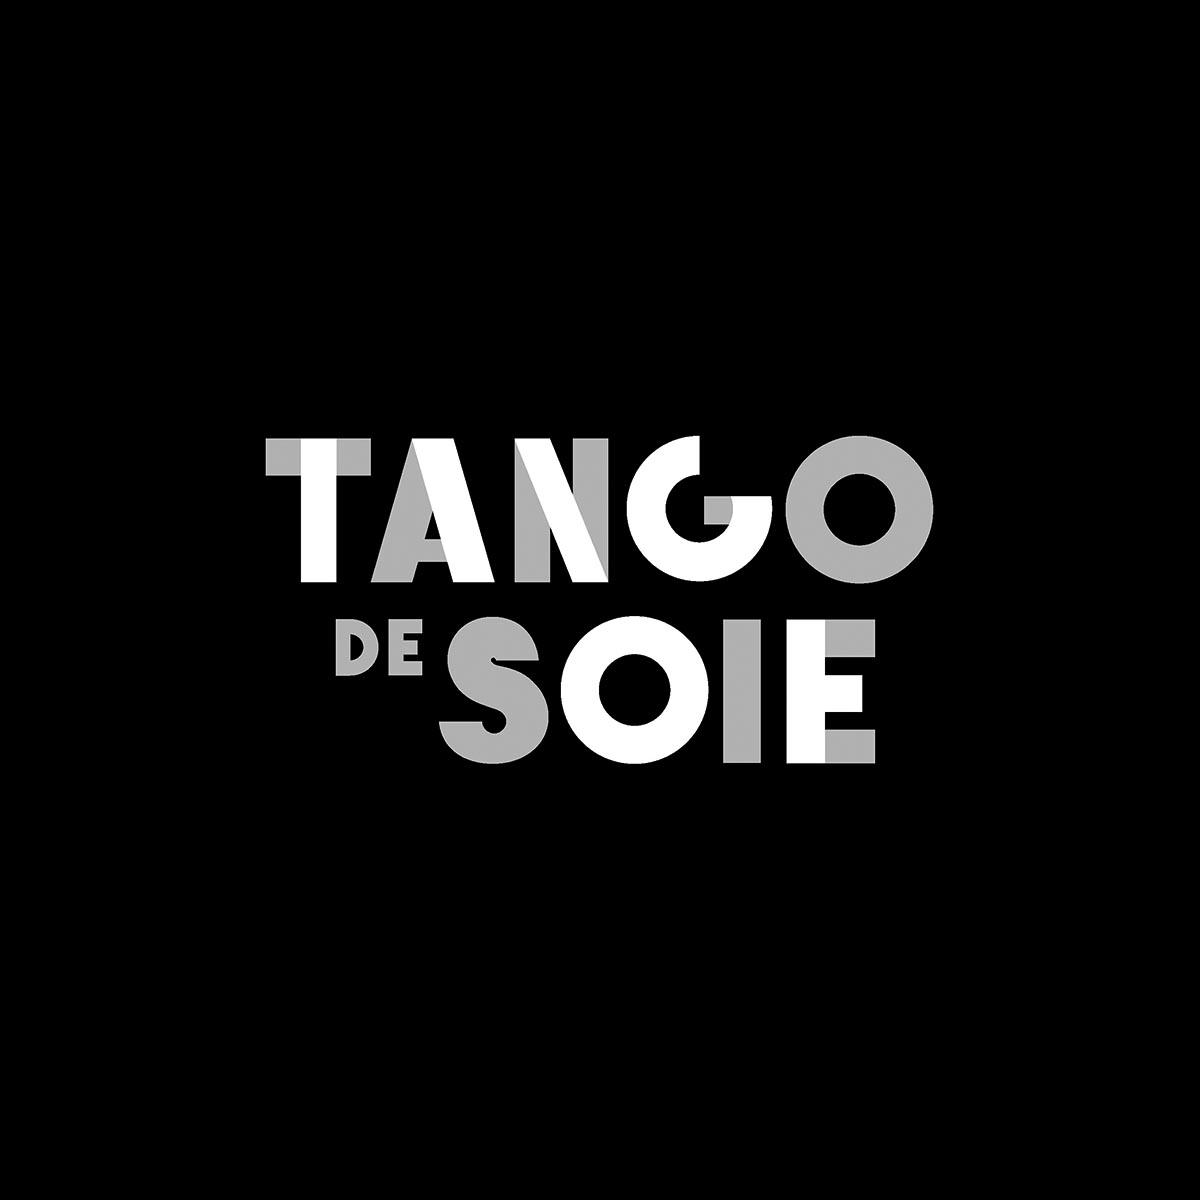 1-tangodesoie